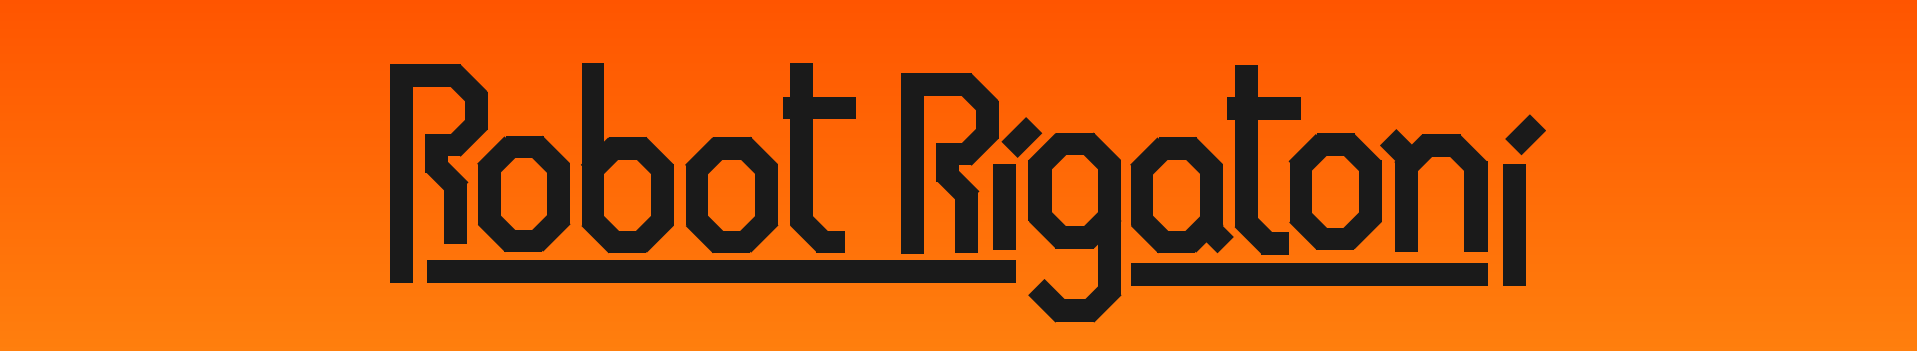 Robot Rigatoni (Alpha)